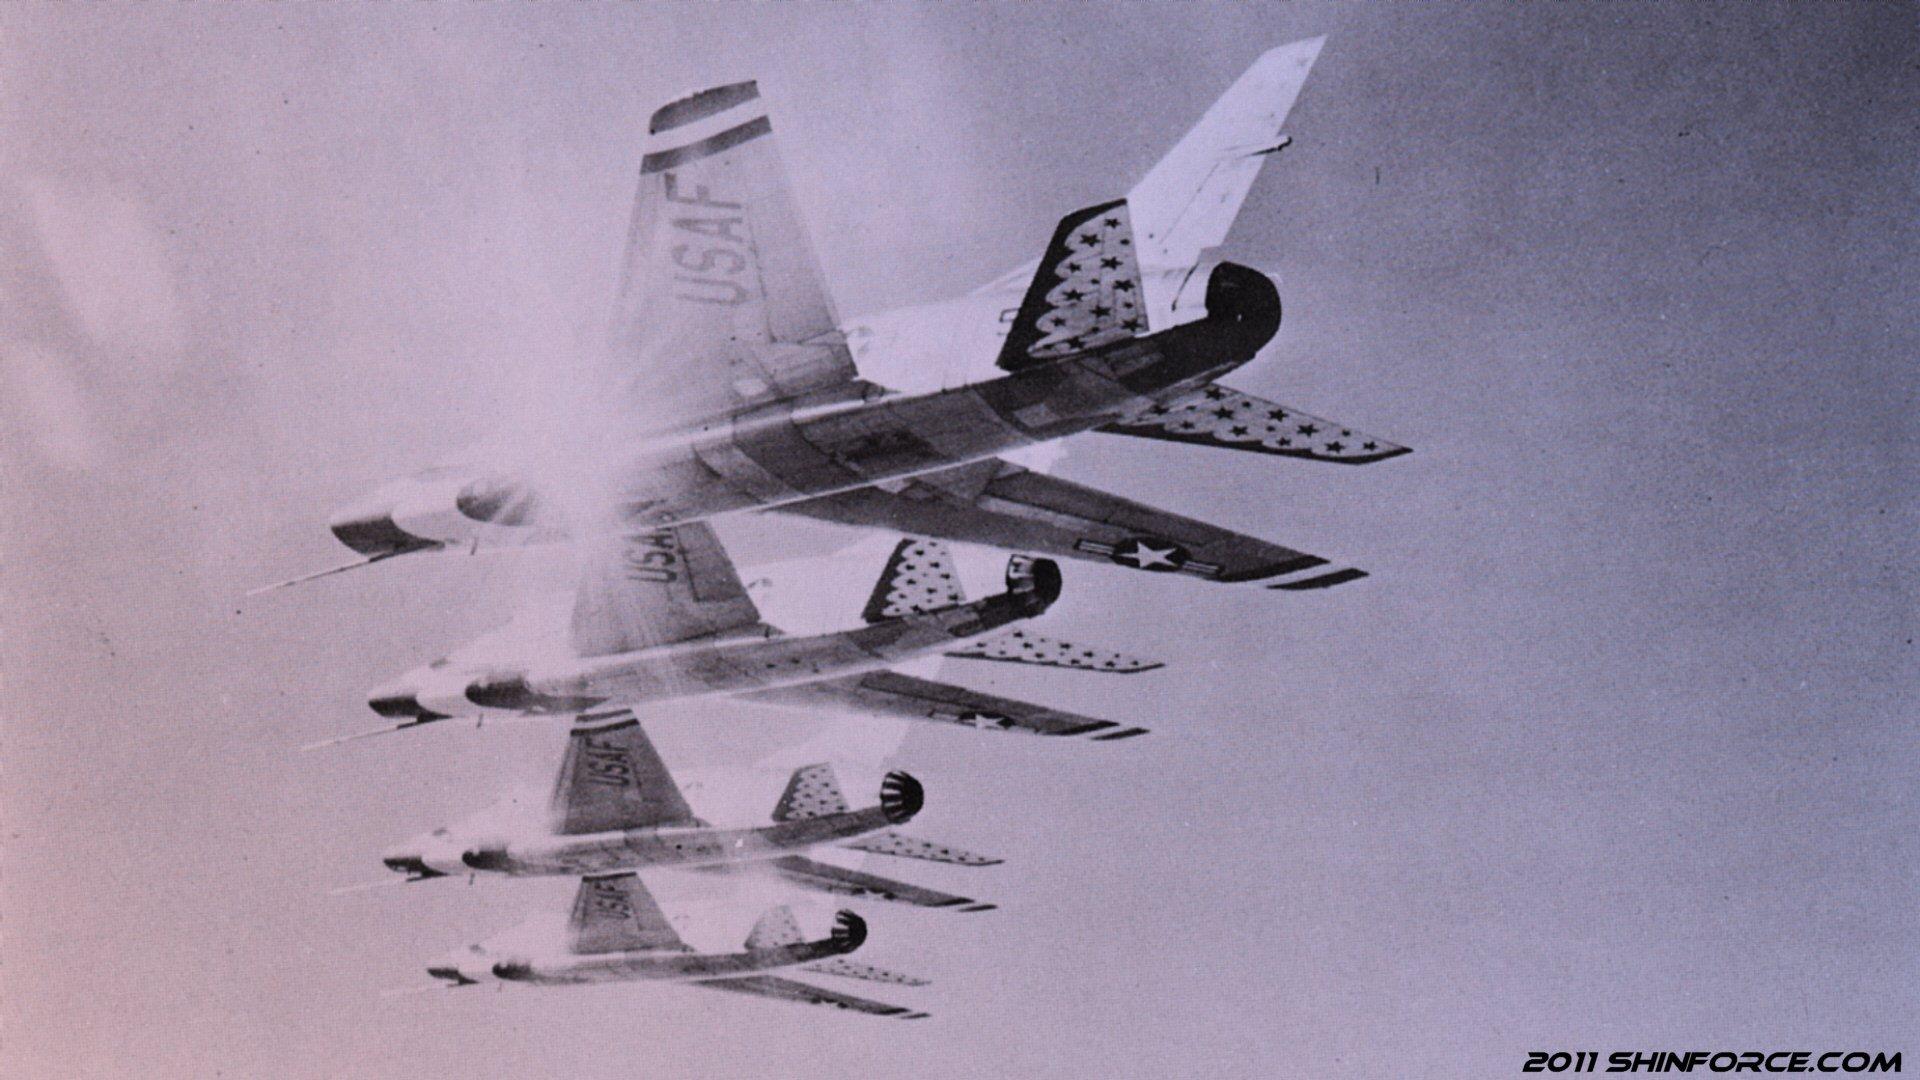 US Air Force Thunderbirds Wallpaper Sega Shin Force Cool 1920x1080